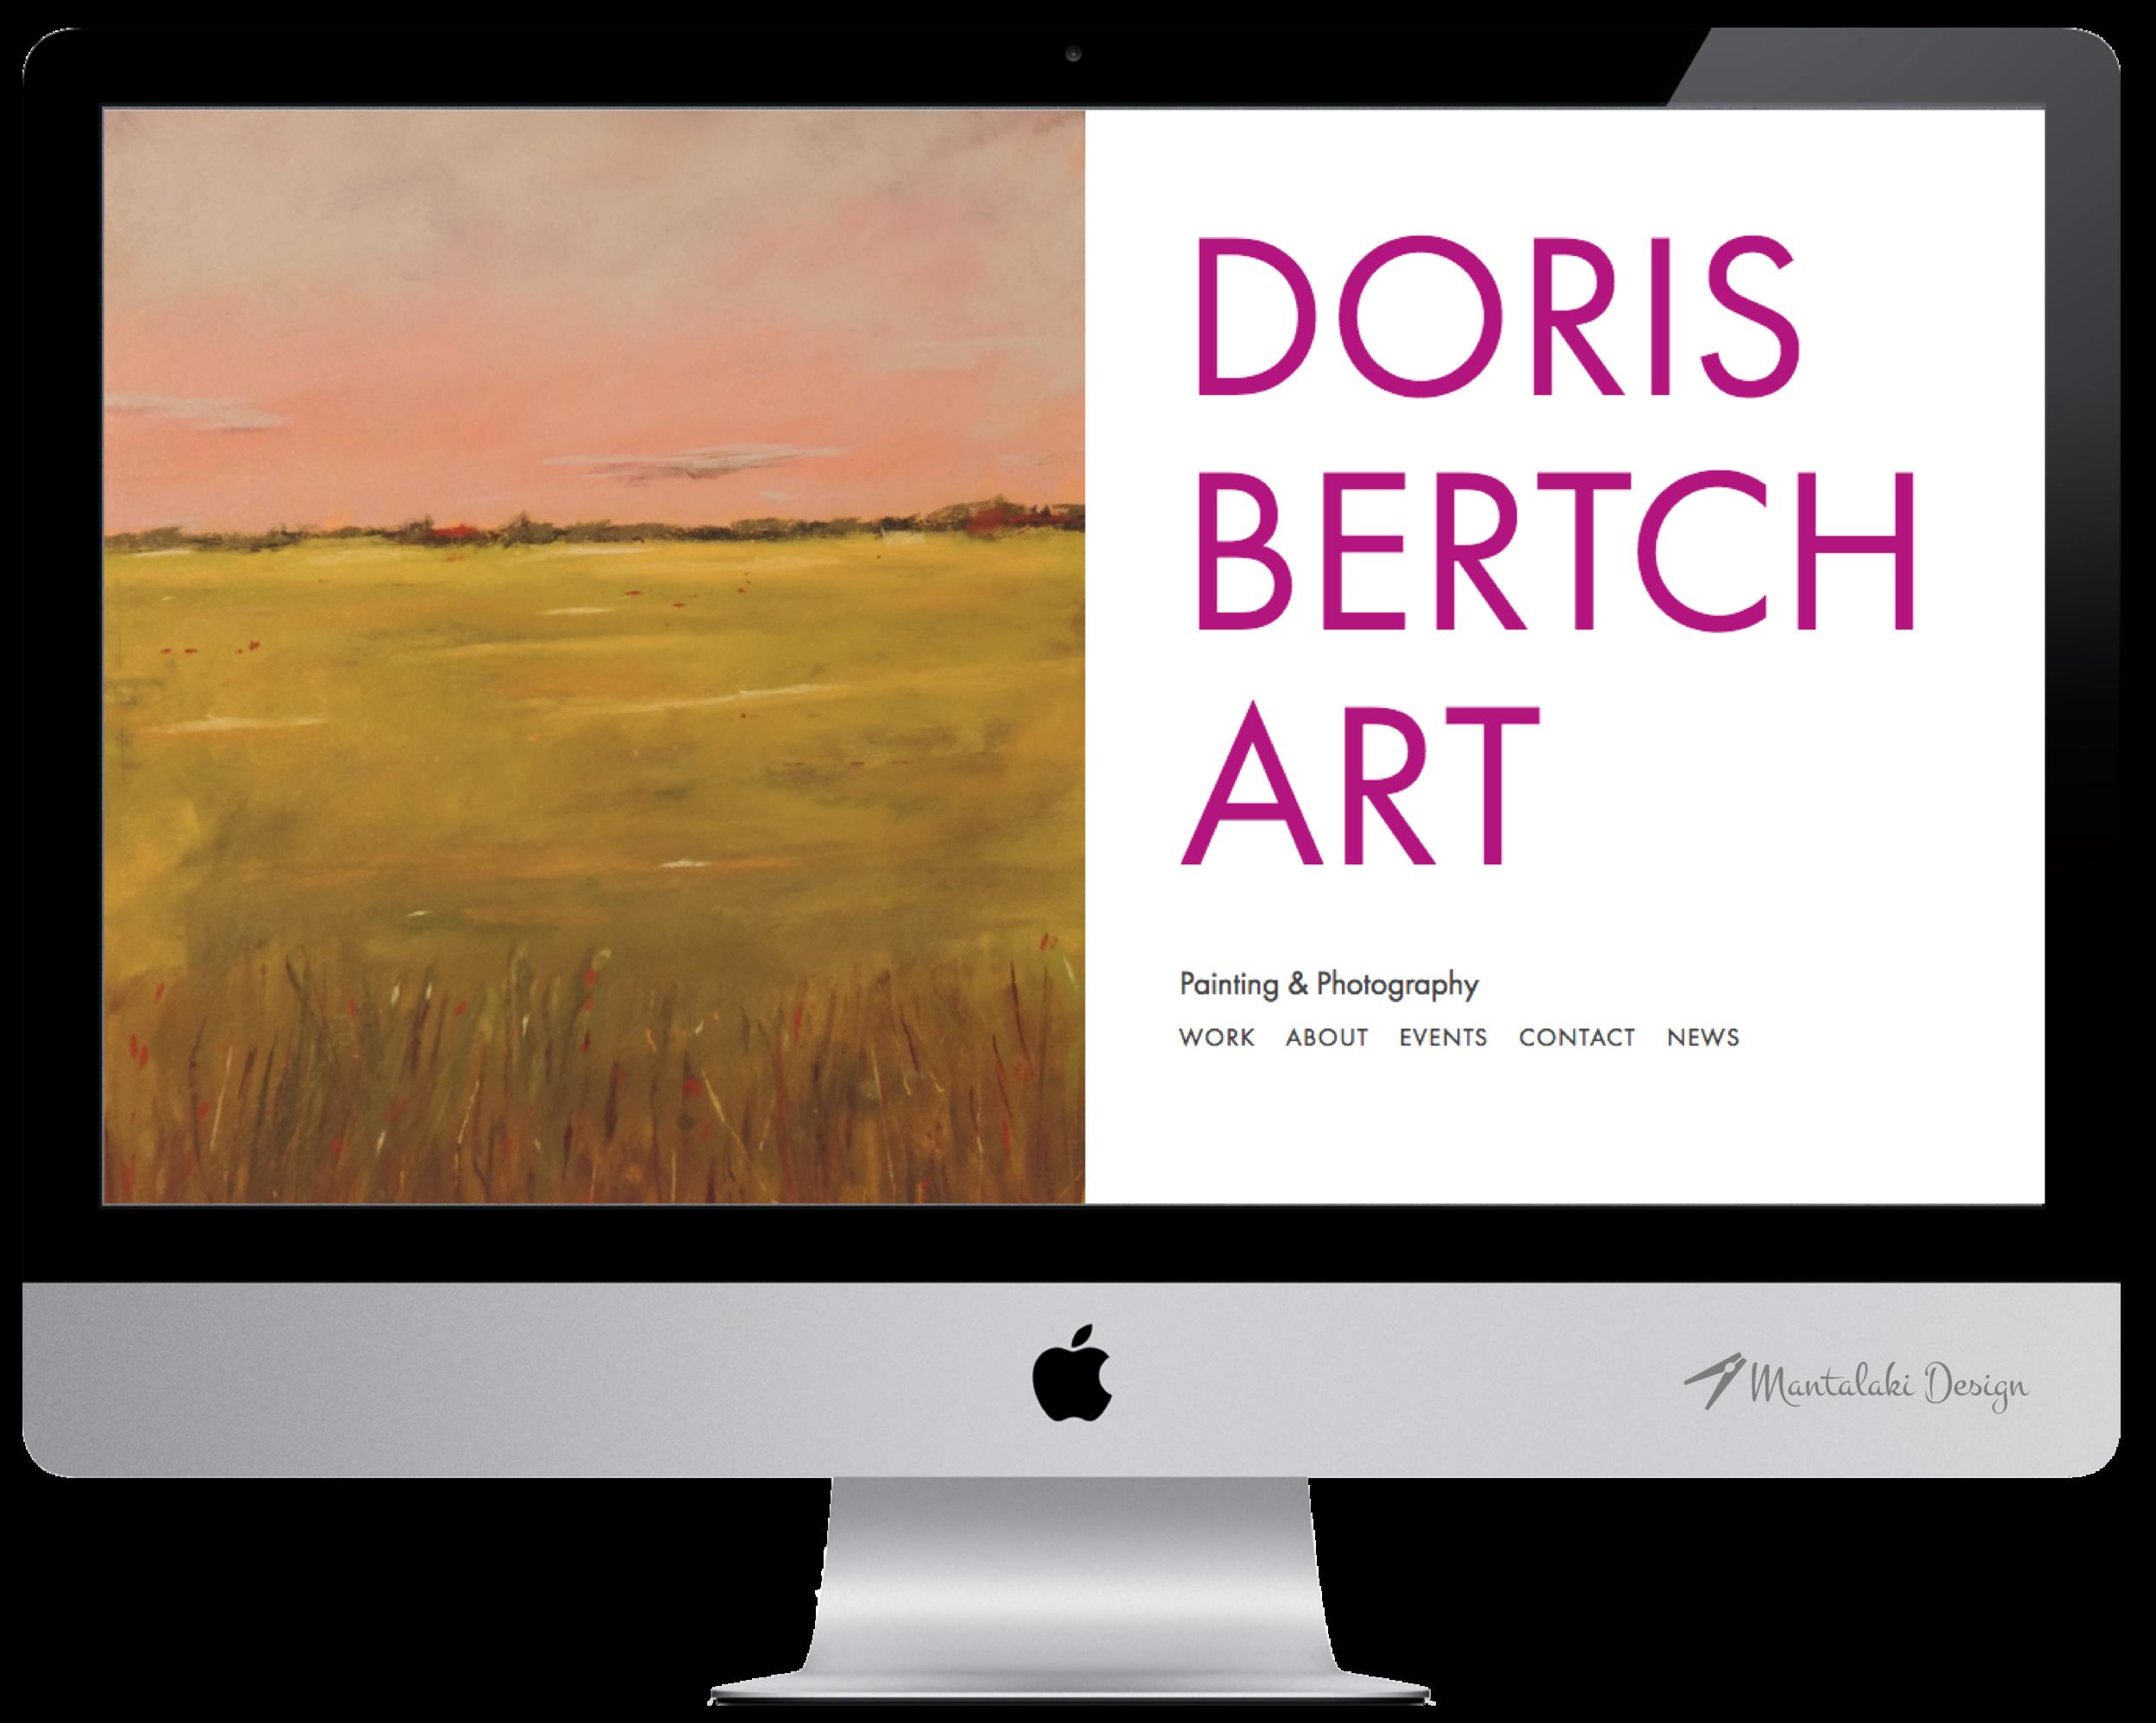 Doris Bertch Art